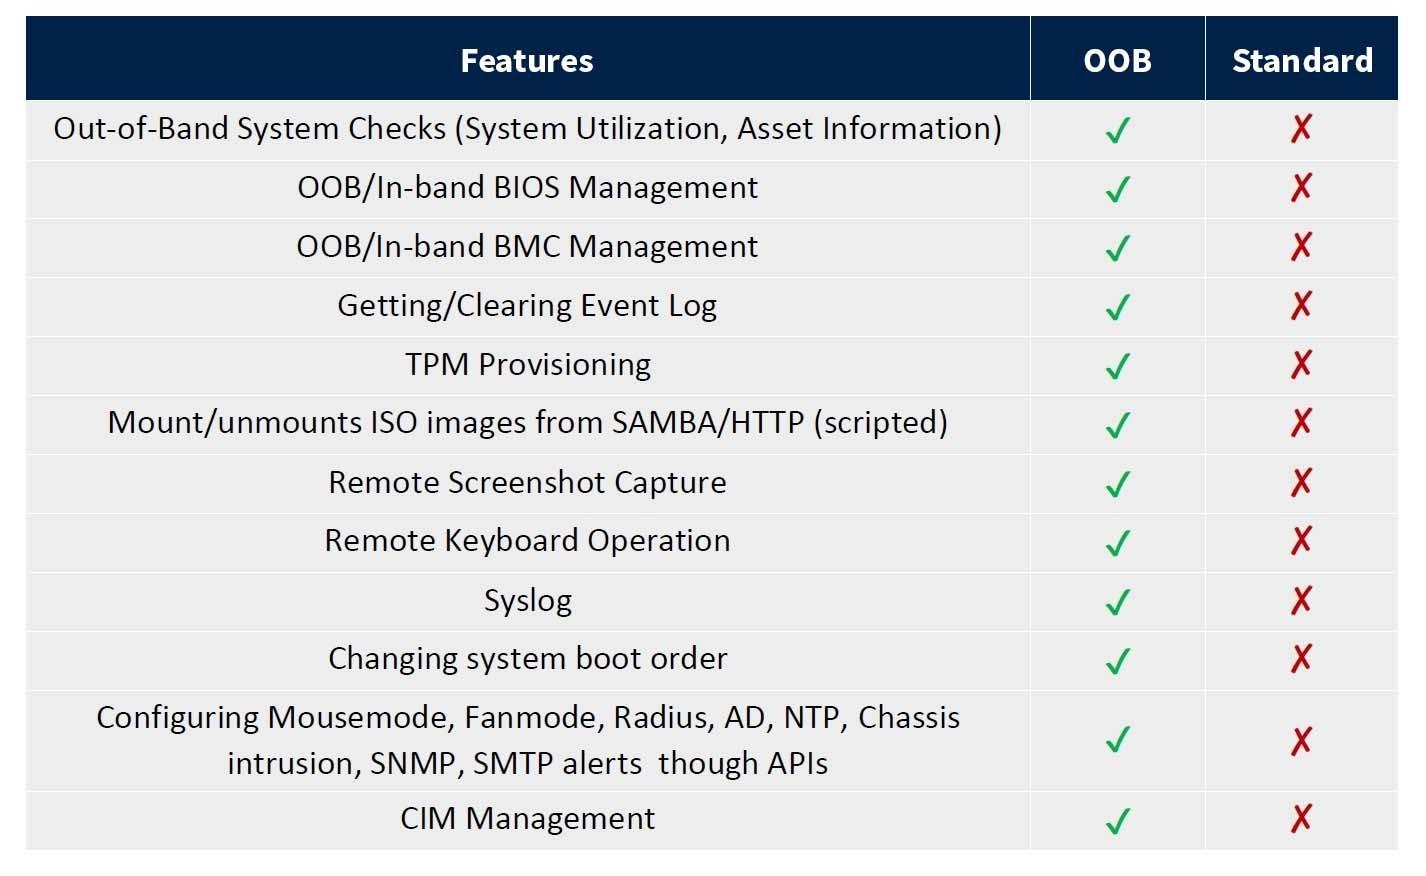 OOB Features